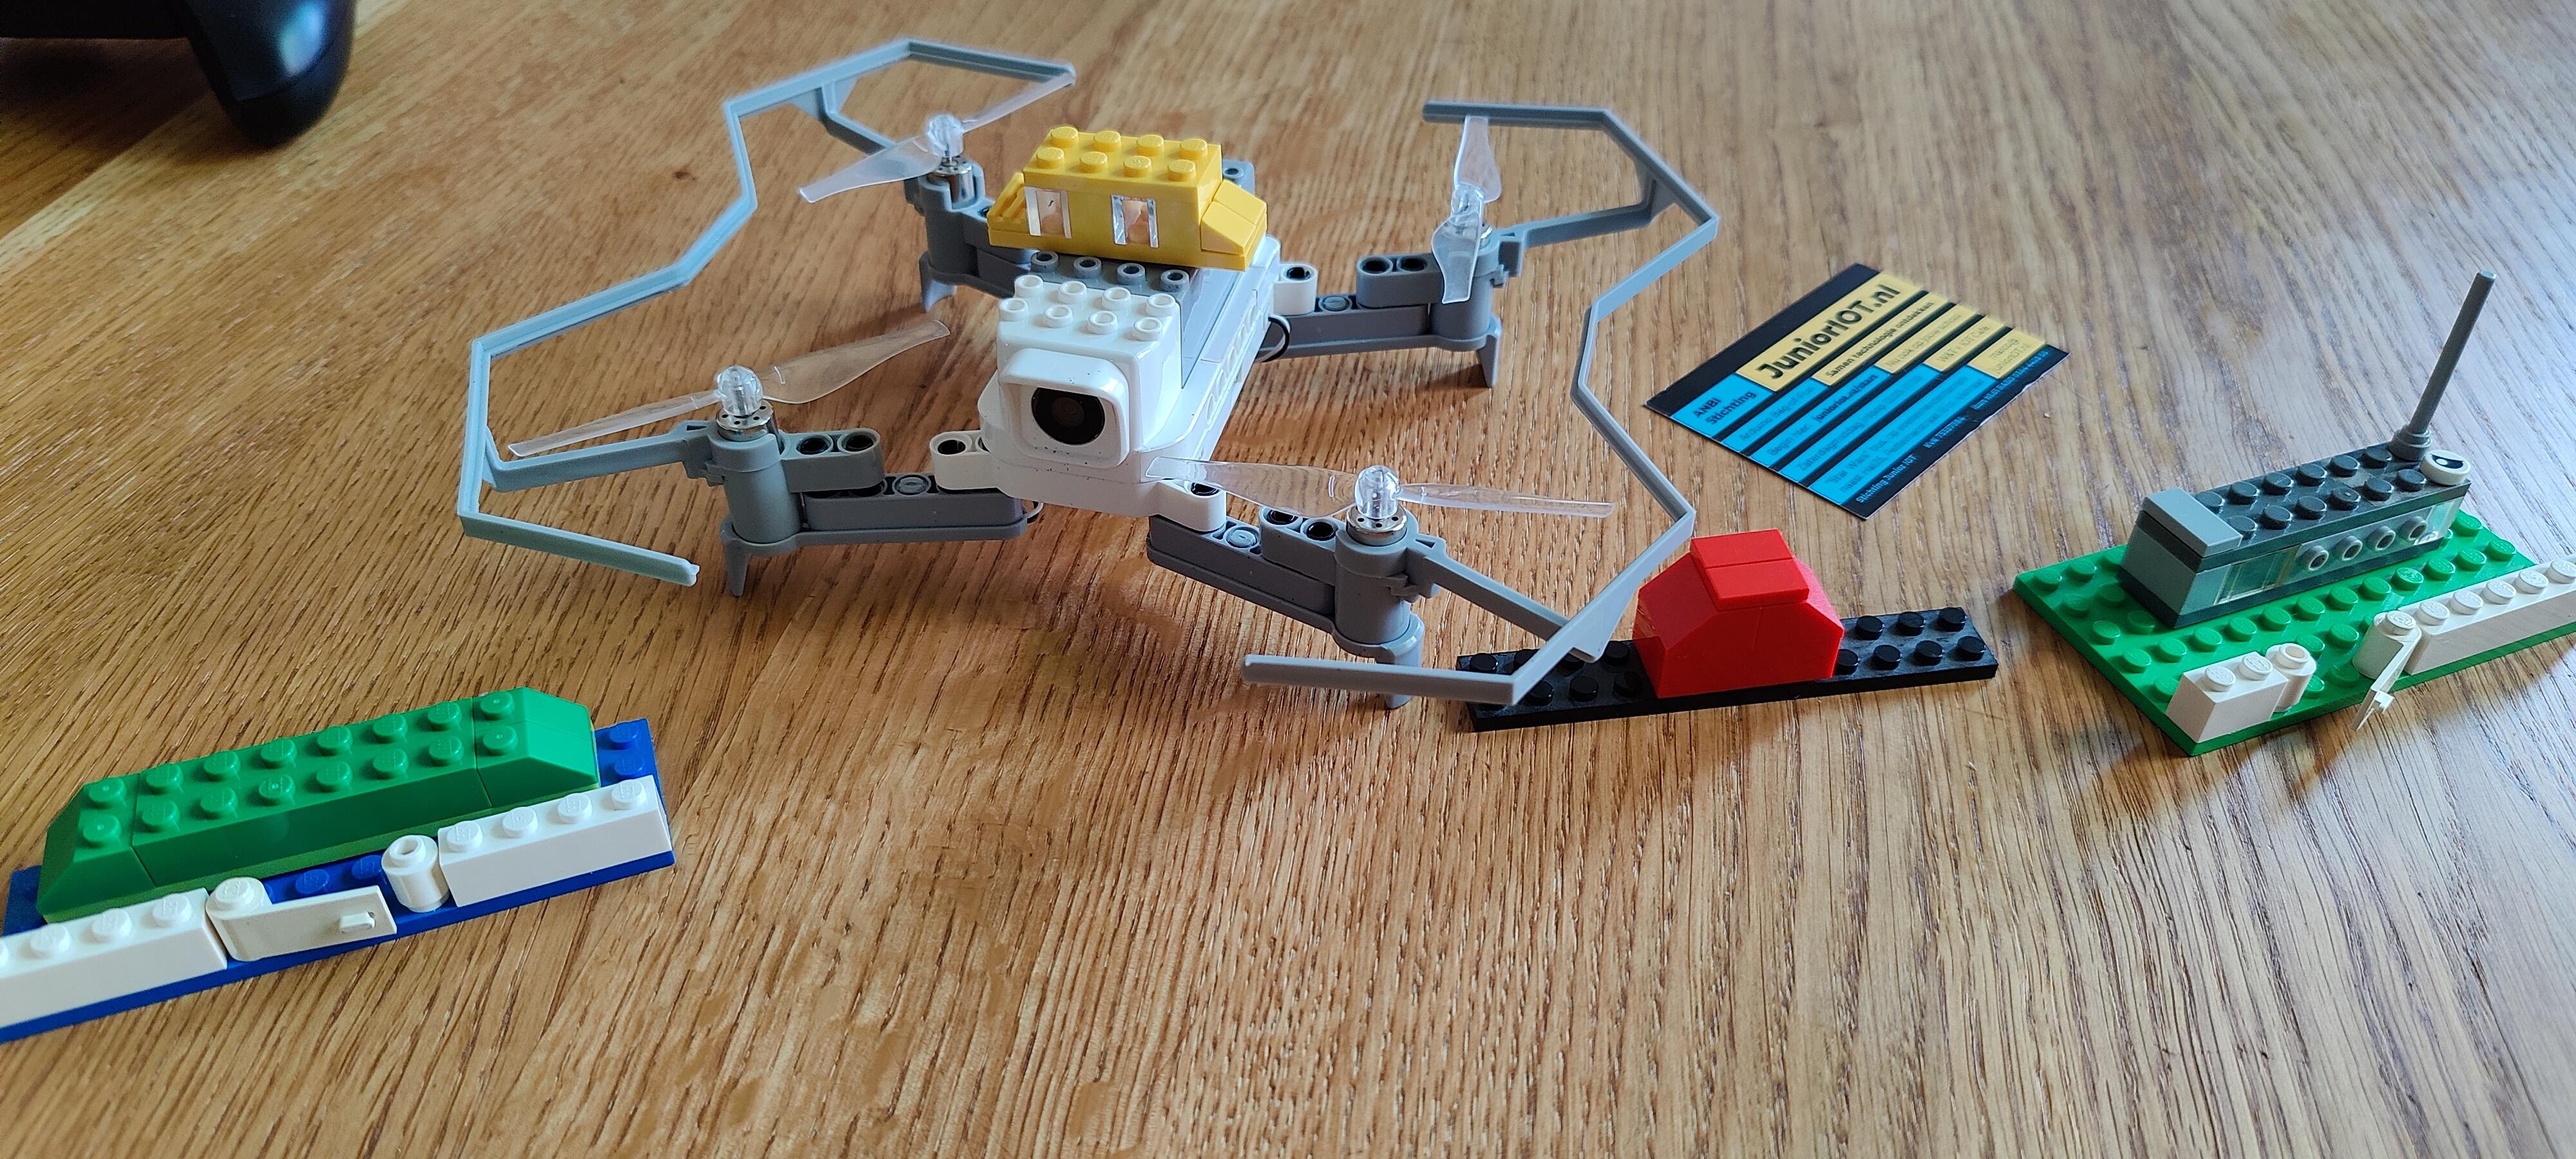 Lab – aan de slag met de Lego-compatible Litebee Drone